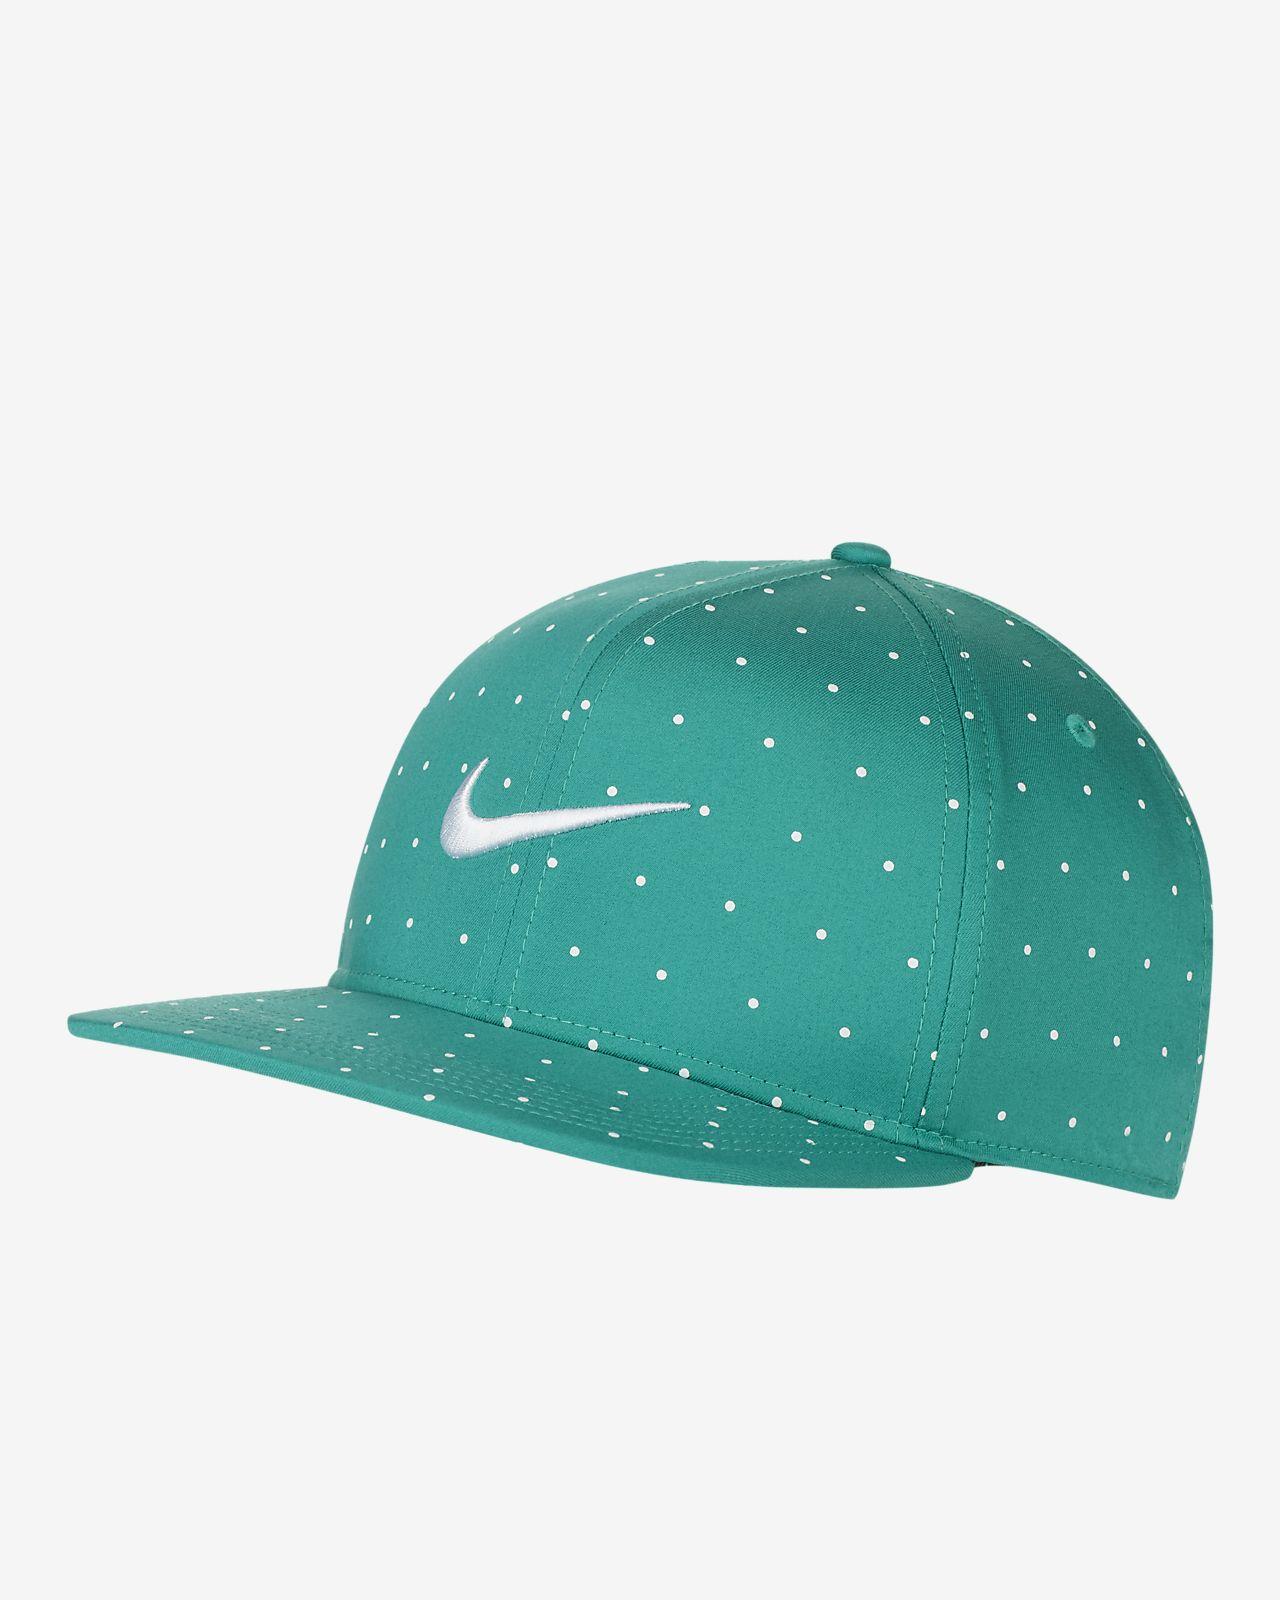 Nike AeroBill Printed Golf Hat